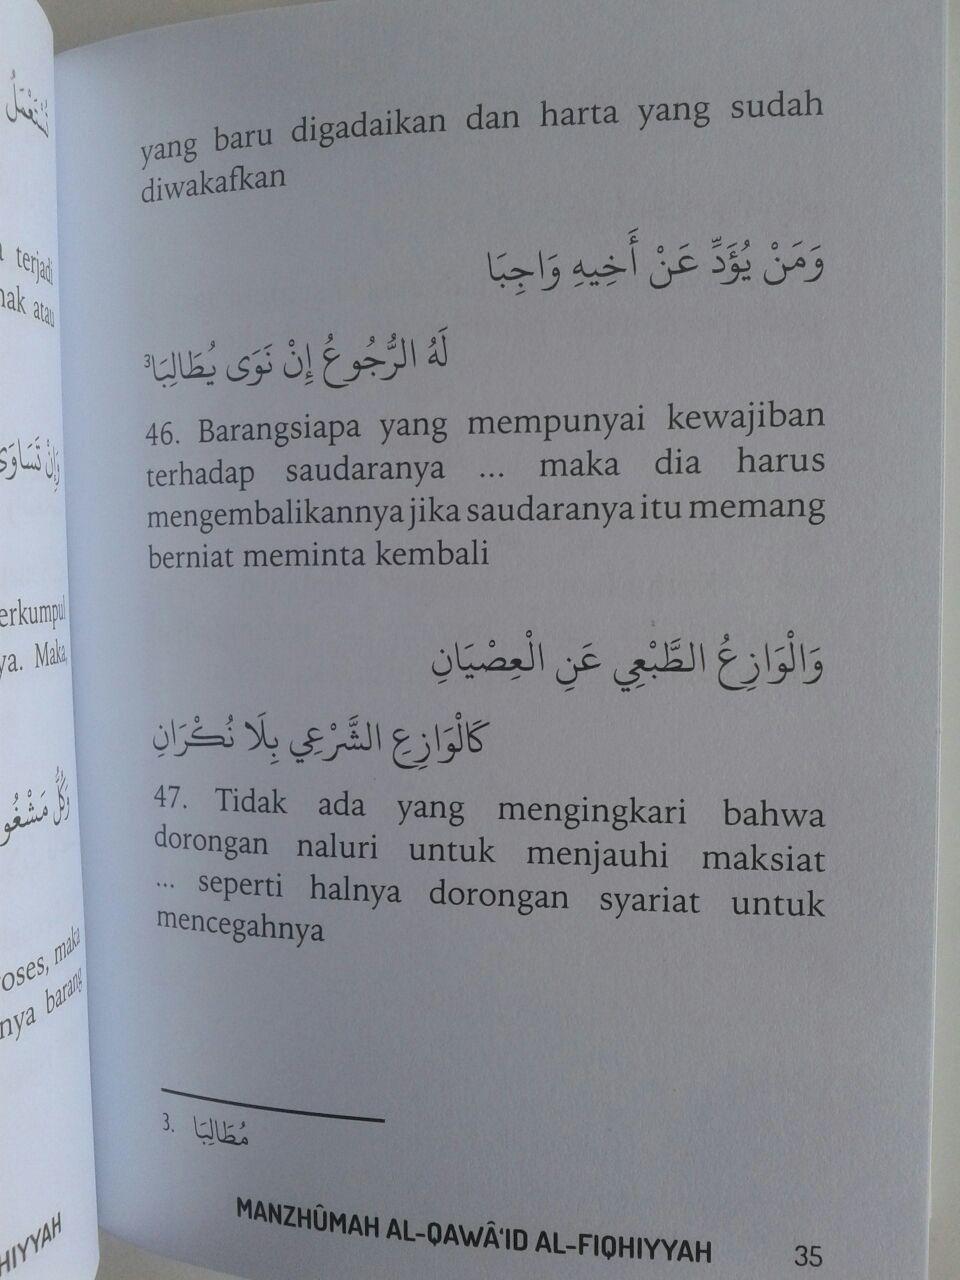 Buku Saku Manzhumah Al-Qawaid Al-Fiqhiyyah As-Sa'diy isi 4